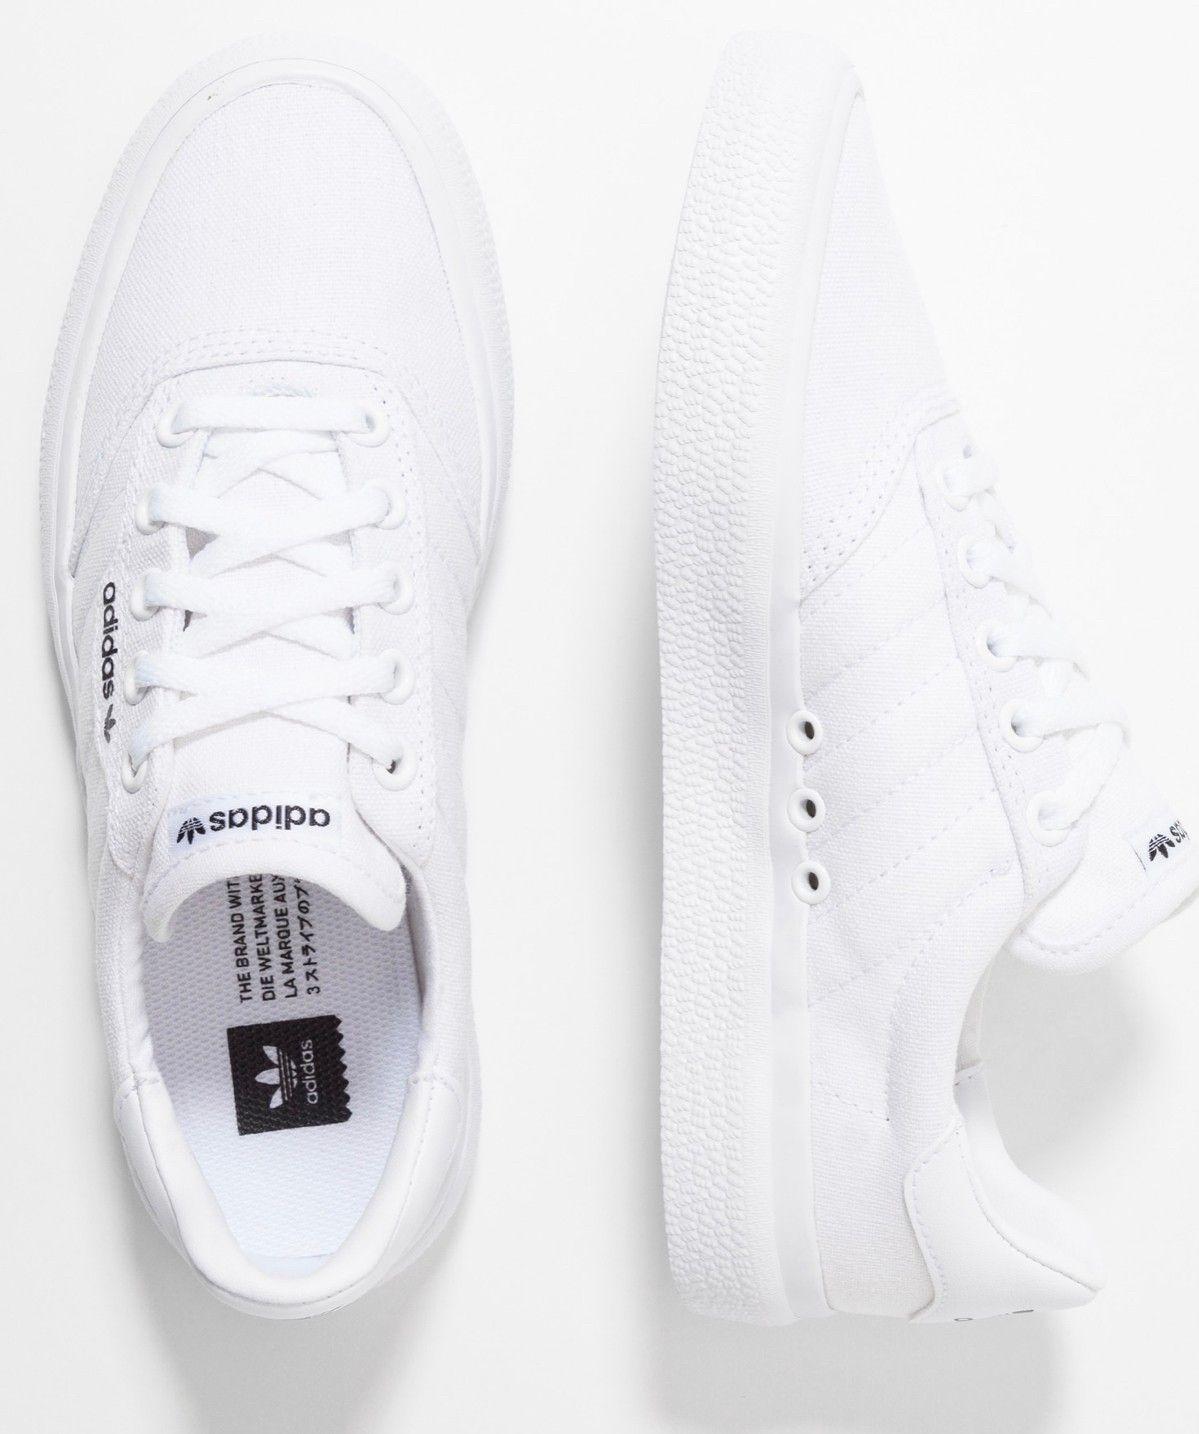 Helt nye Adidas sko str: 42 aldri brukt | FINN.no